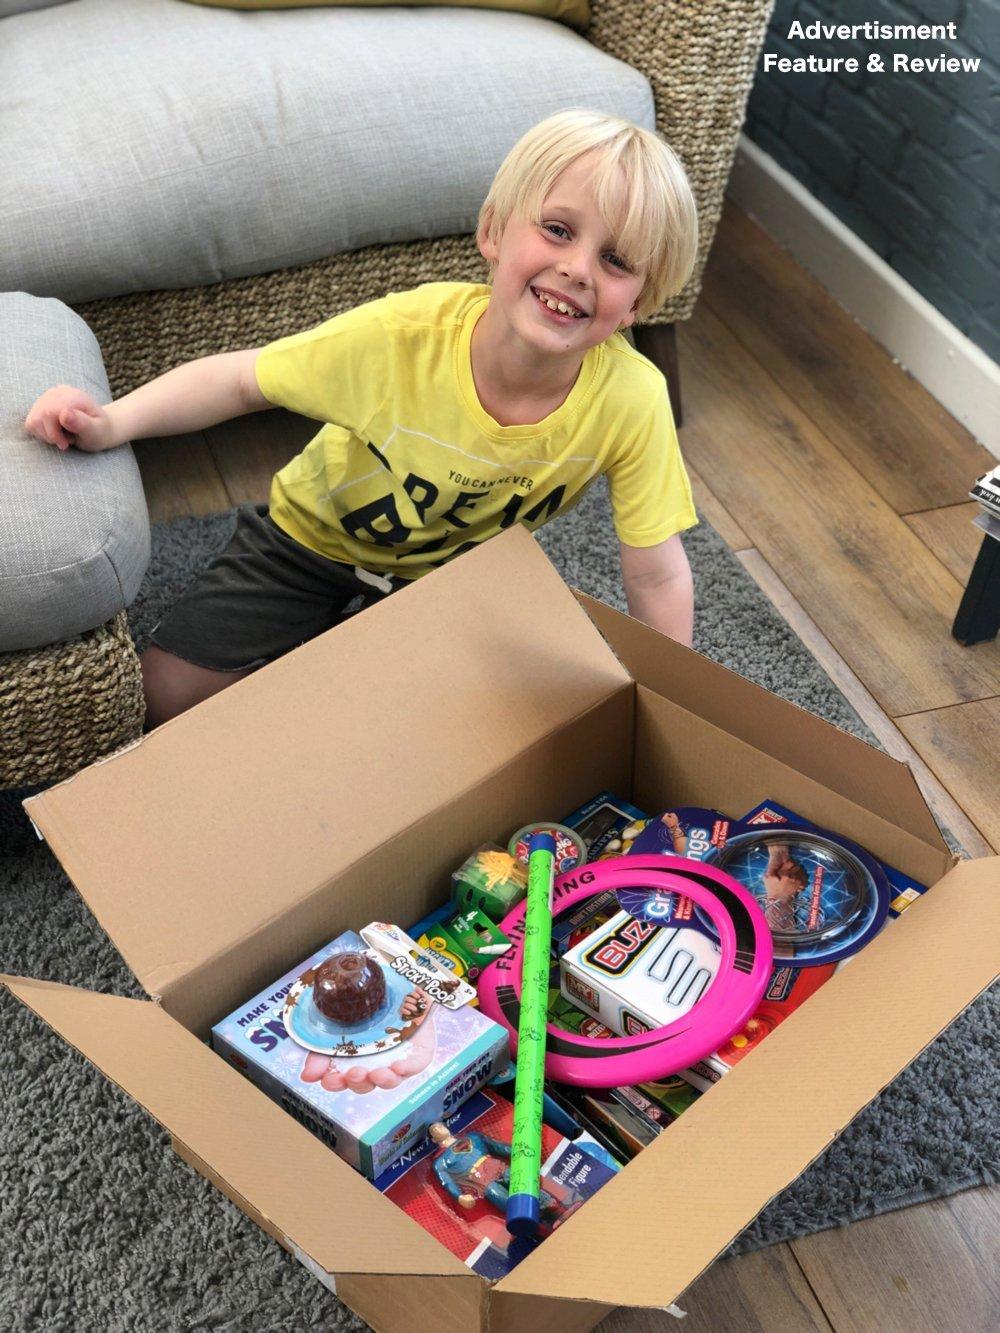 boy opening box of toys from poundtoy